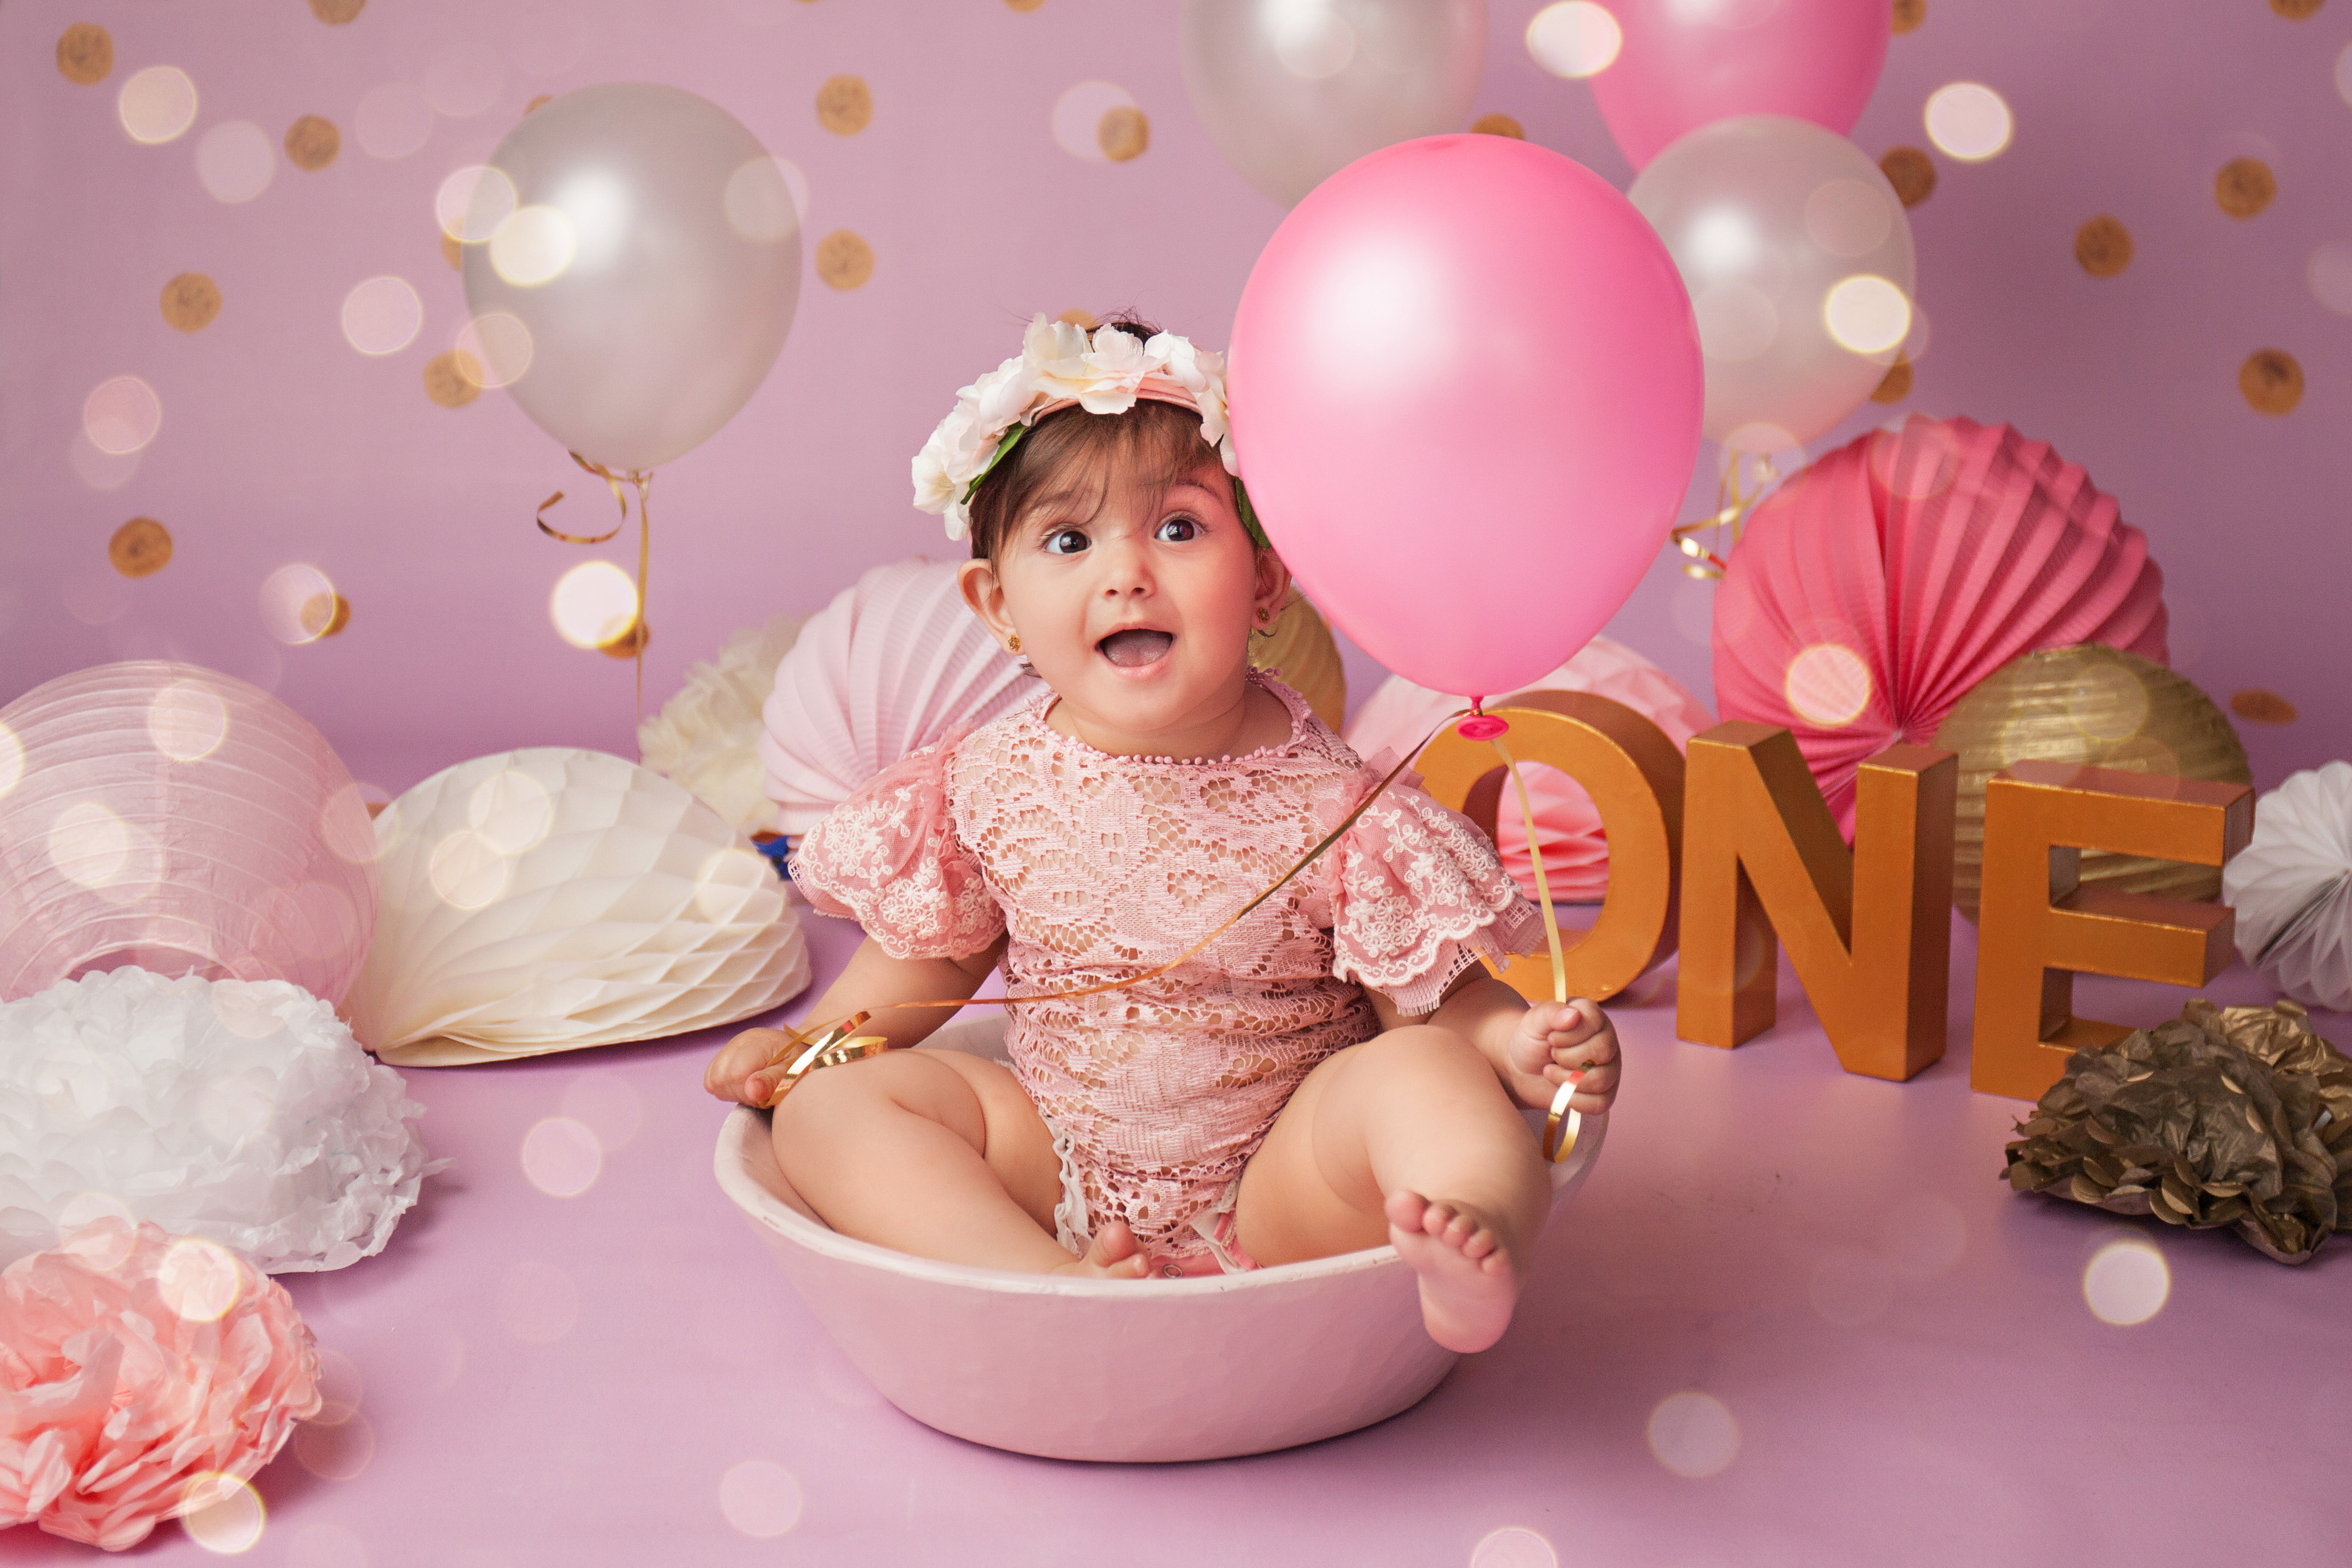 Geburtstags-Fotoshooting Baby Mädchen mit Luftballon